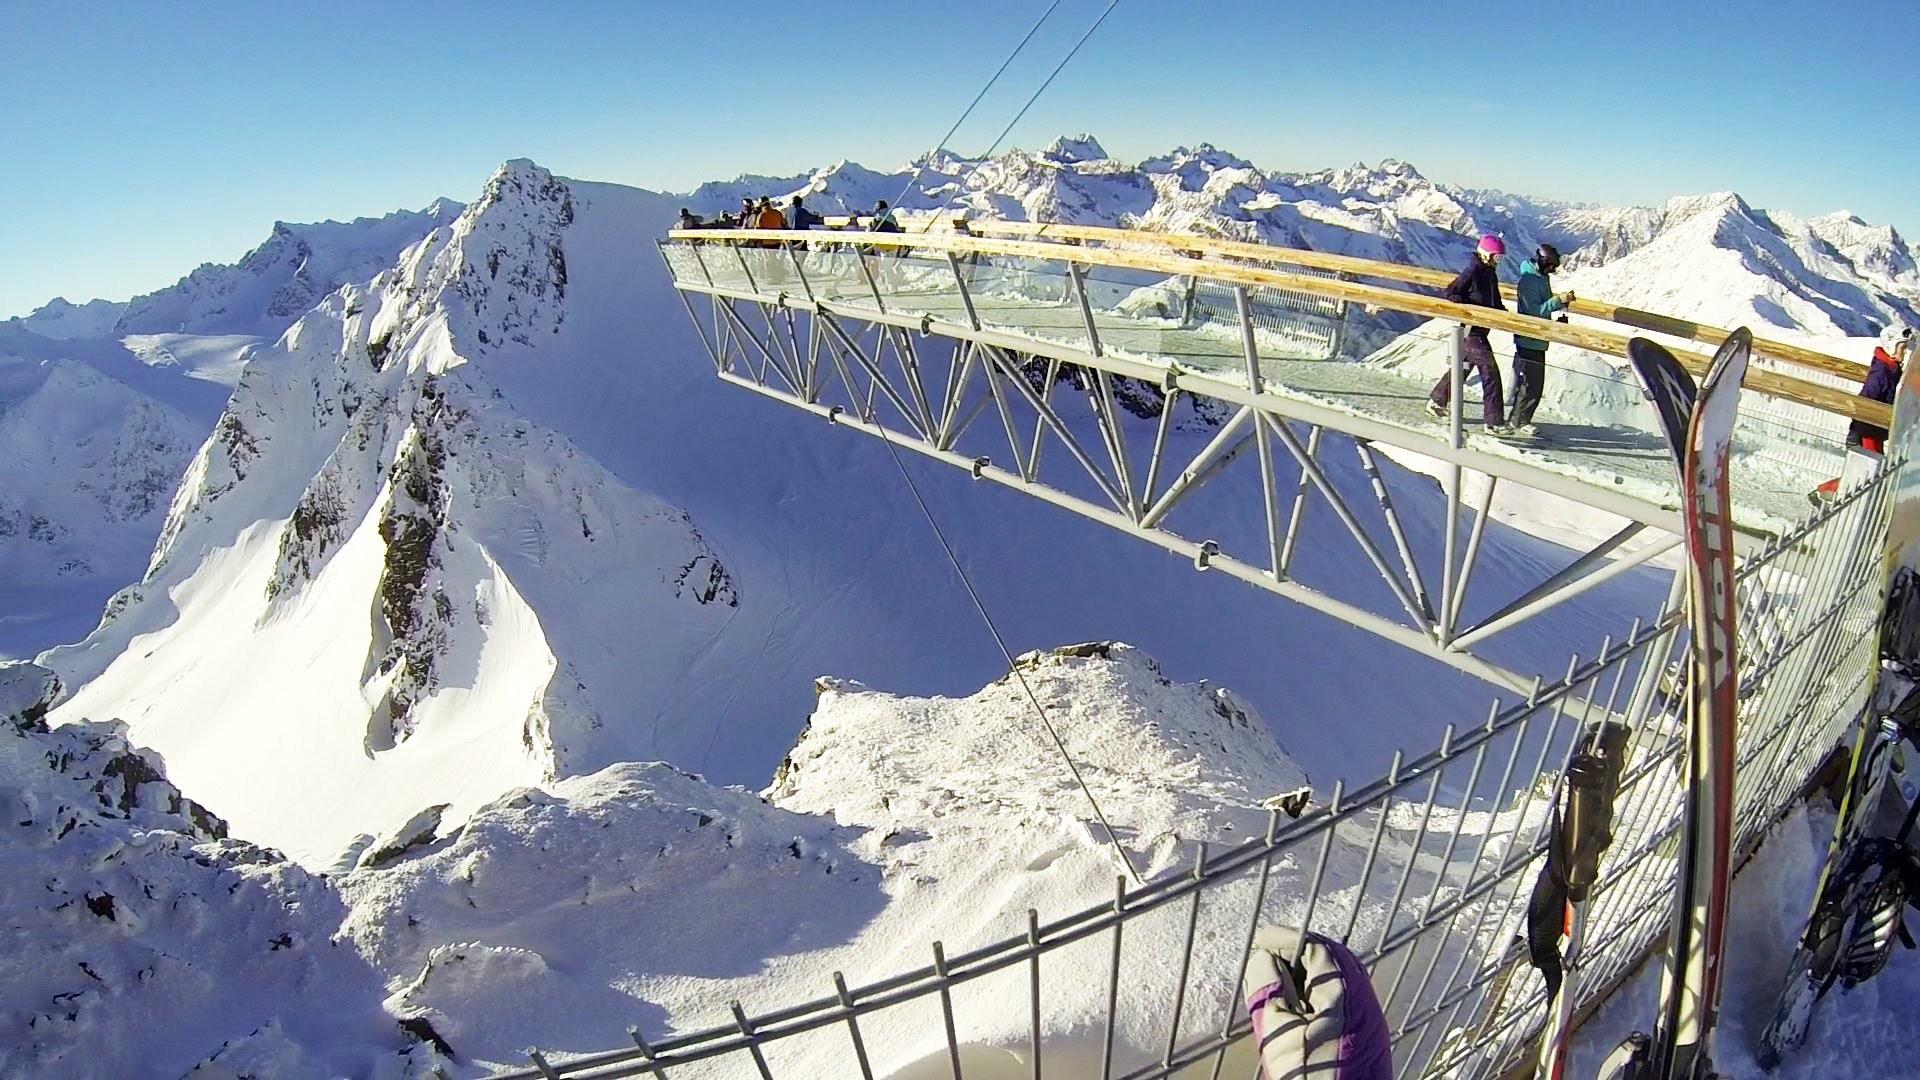 snowboarding s rsvt  snowboarding s